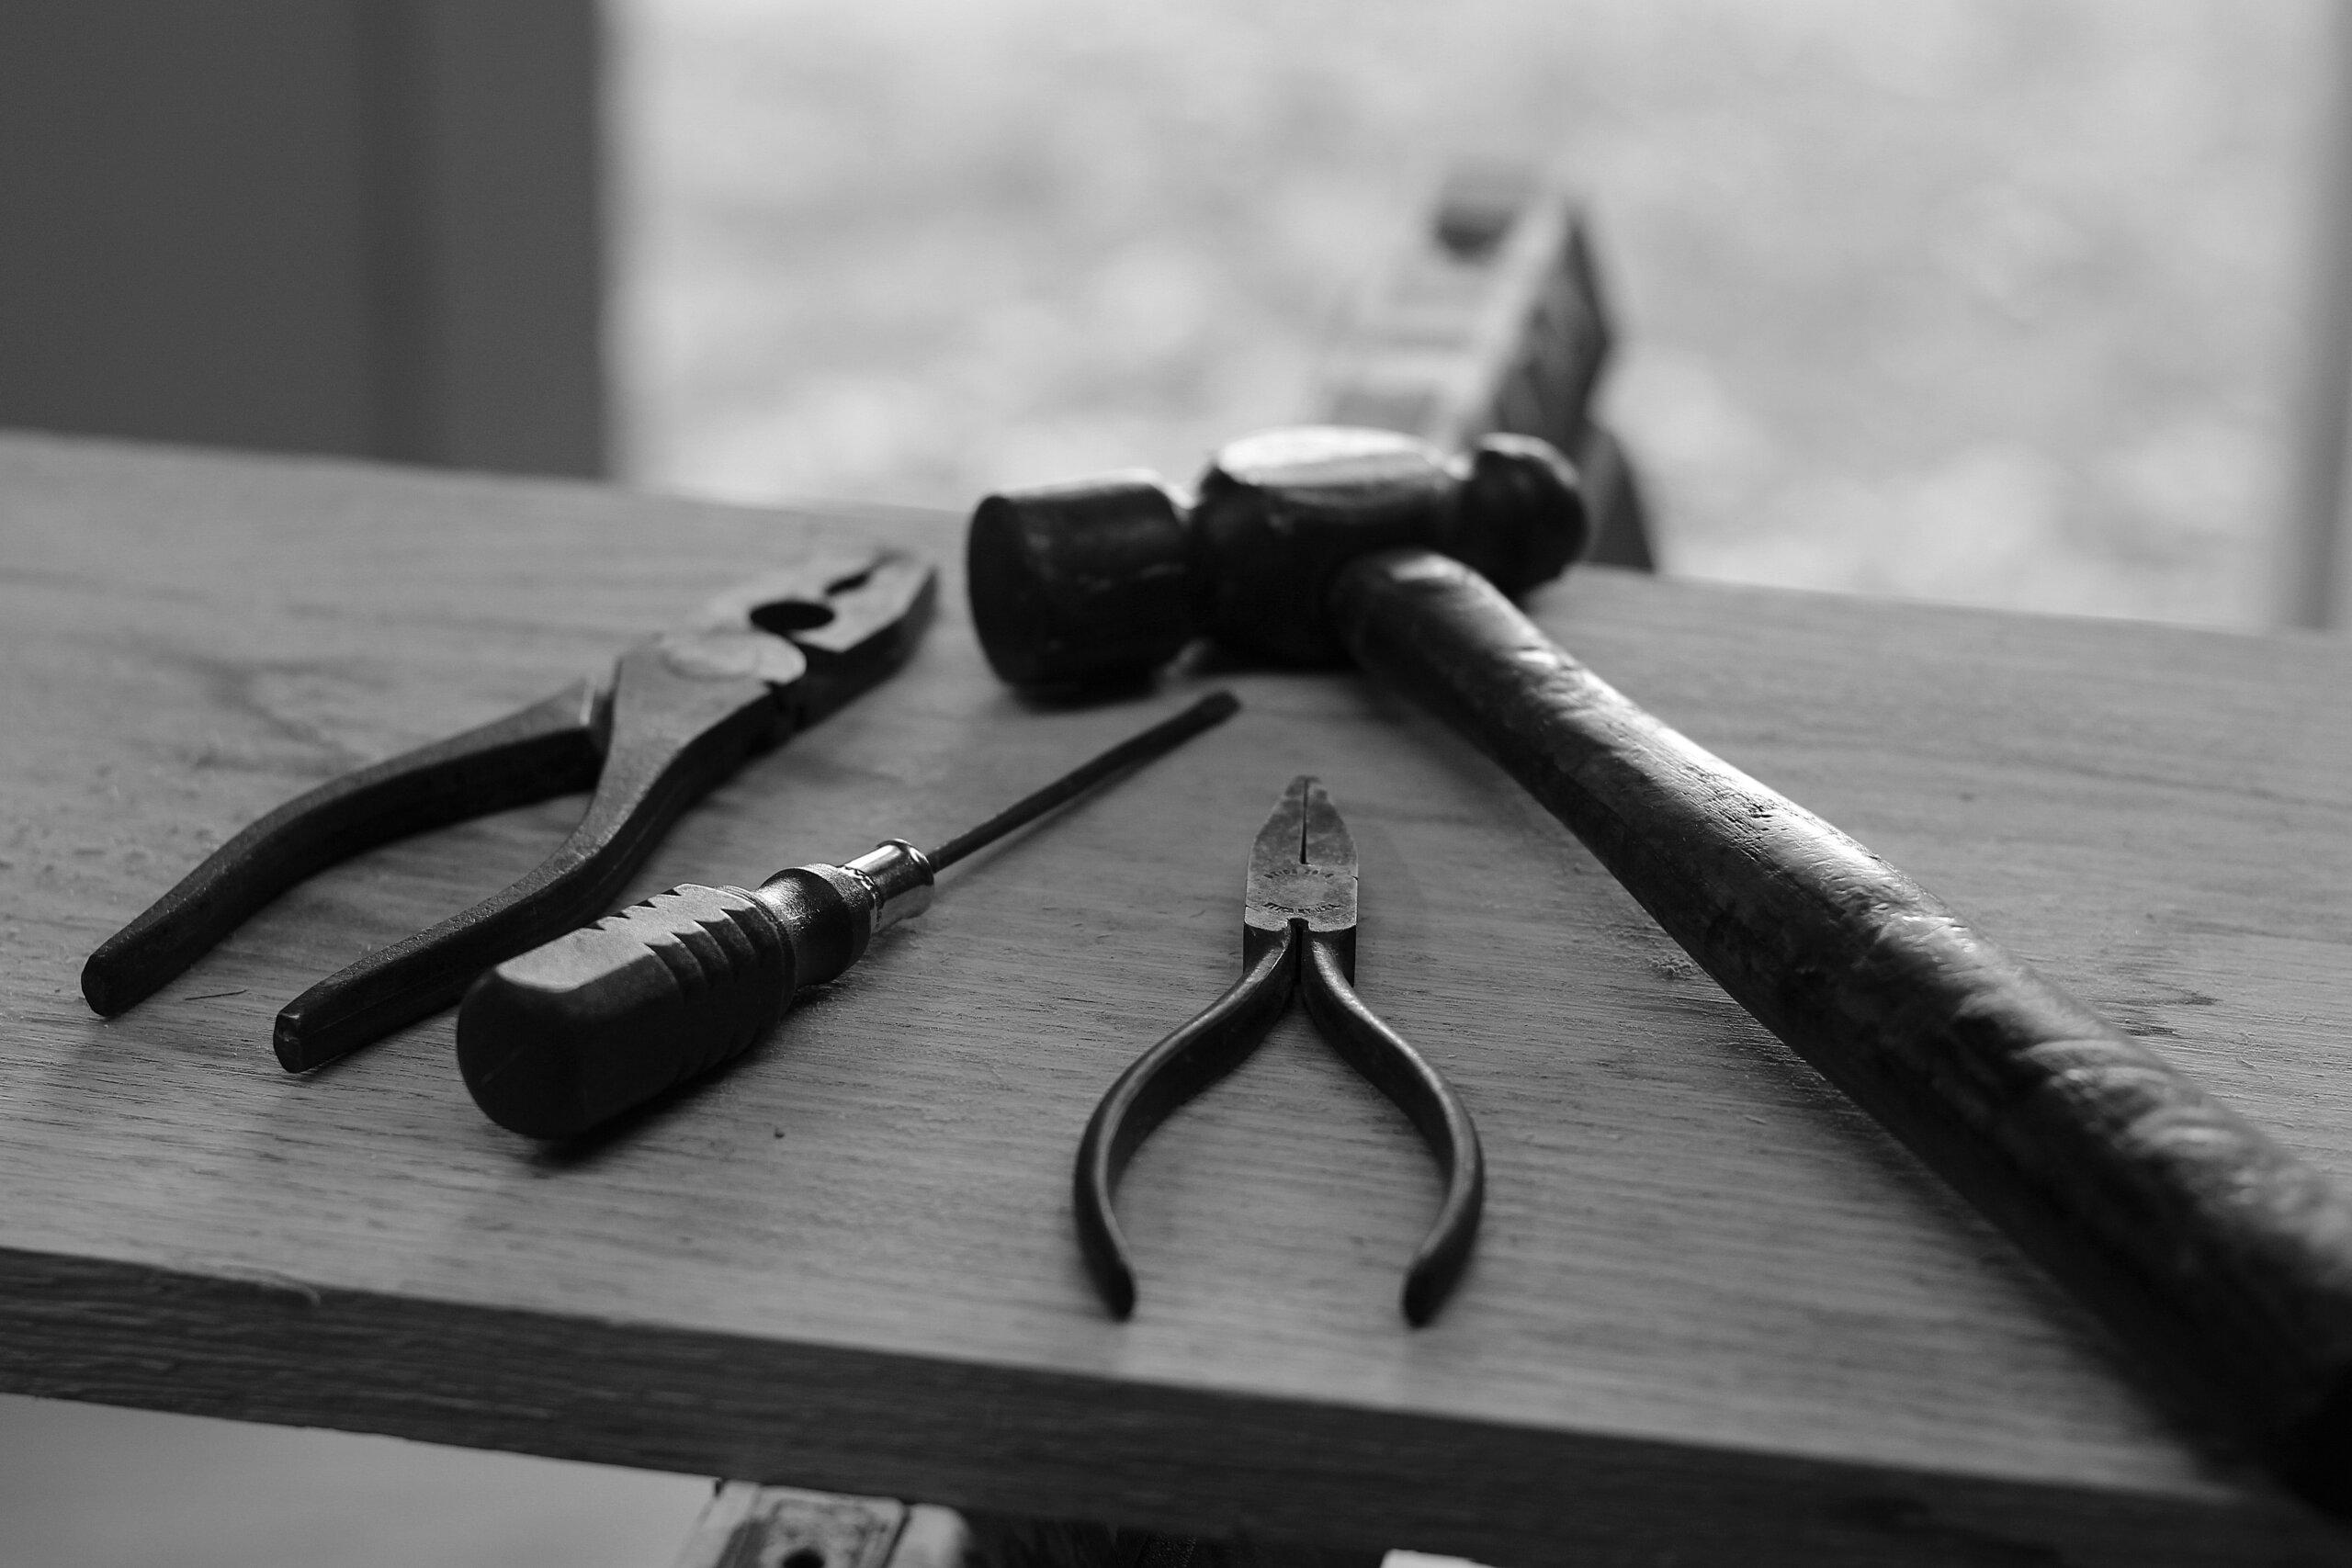 DIY Dumbwaiters: Most Common Pitfalls